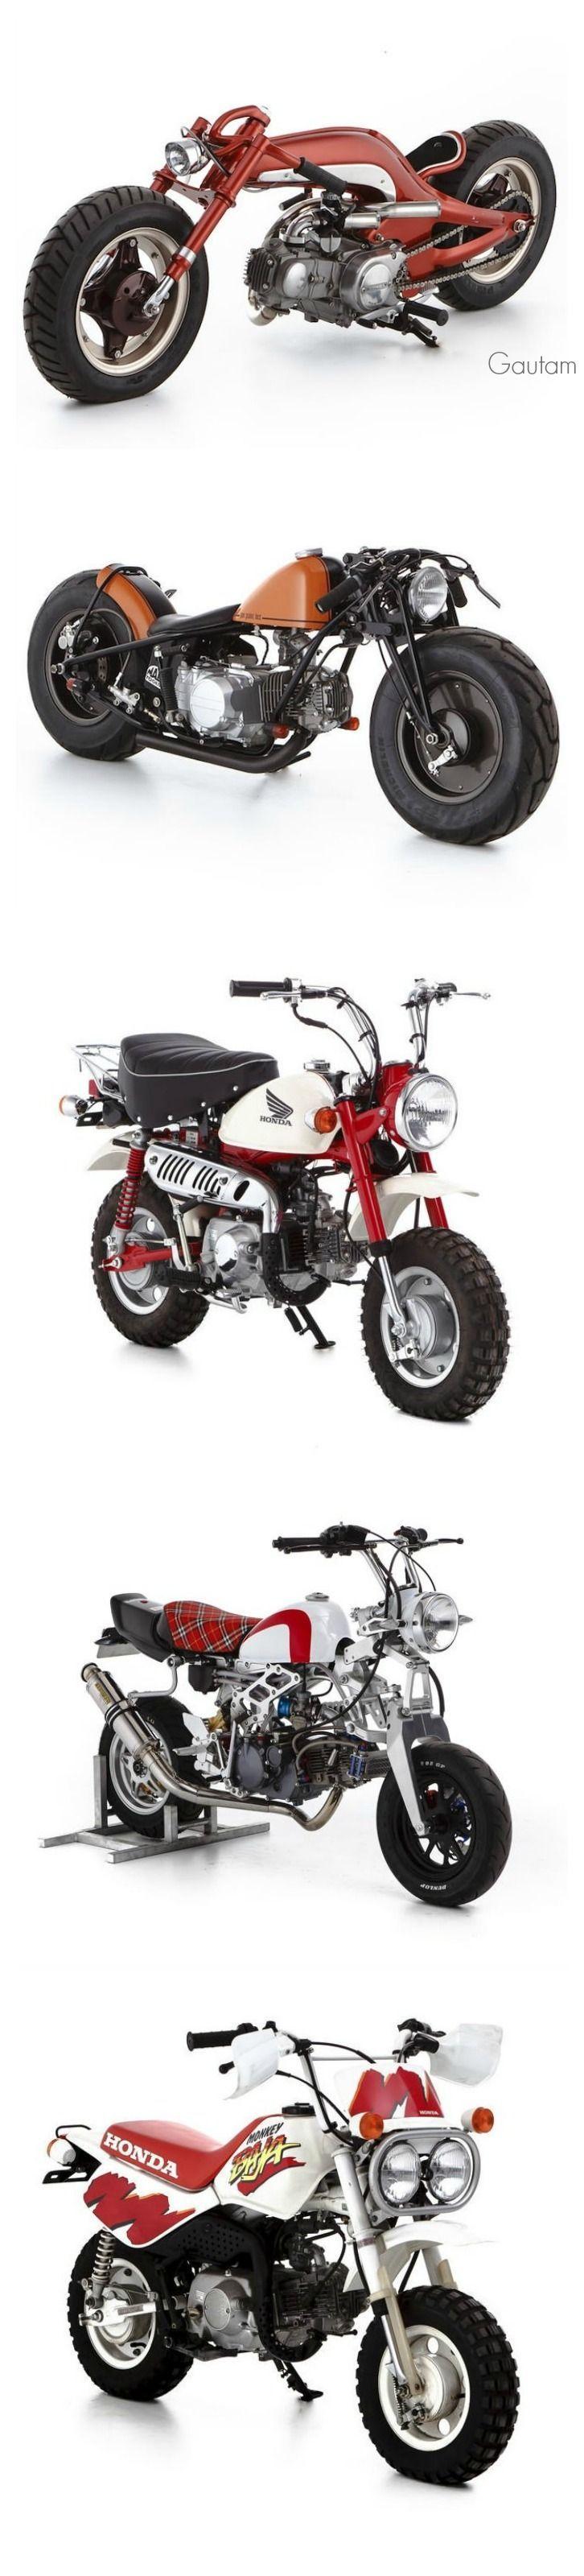 pin oleh danar donuth di bike pinterest motorrad mini. Black Bedroom Furniture Sets. Home Design Ideas